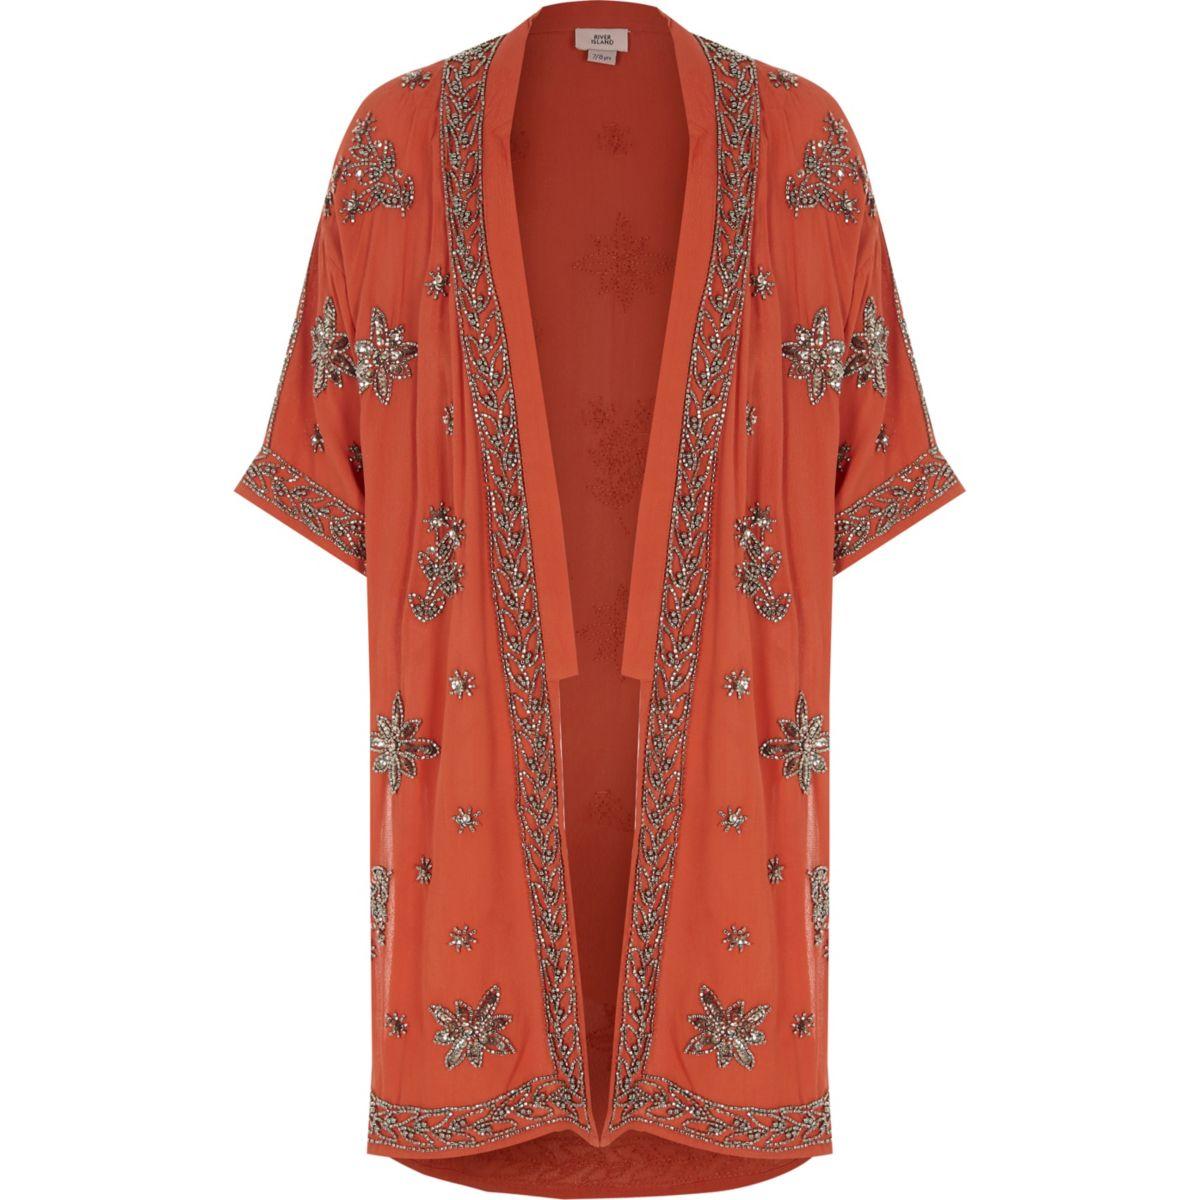 Kimono rouille orné pour fille